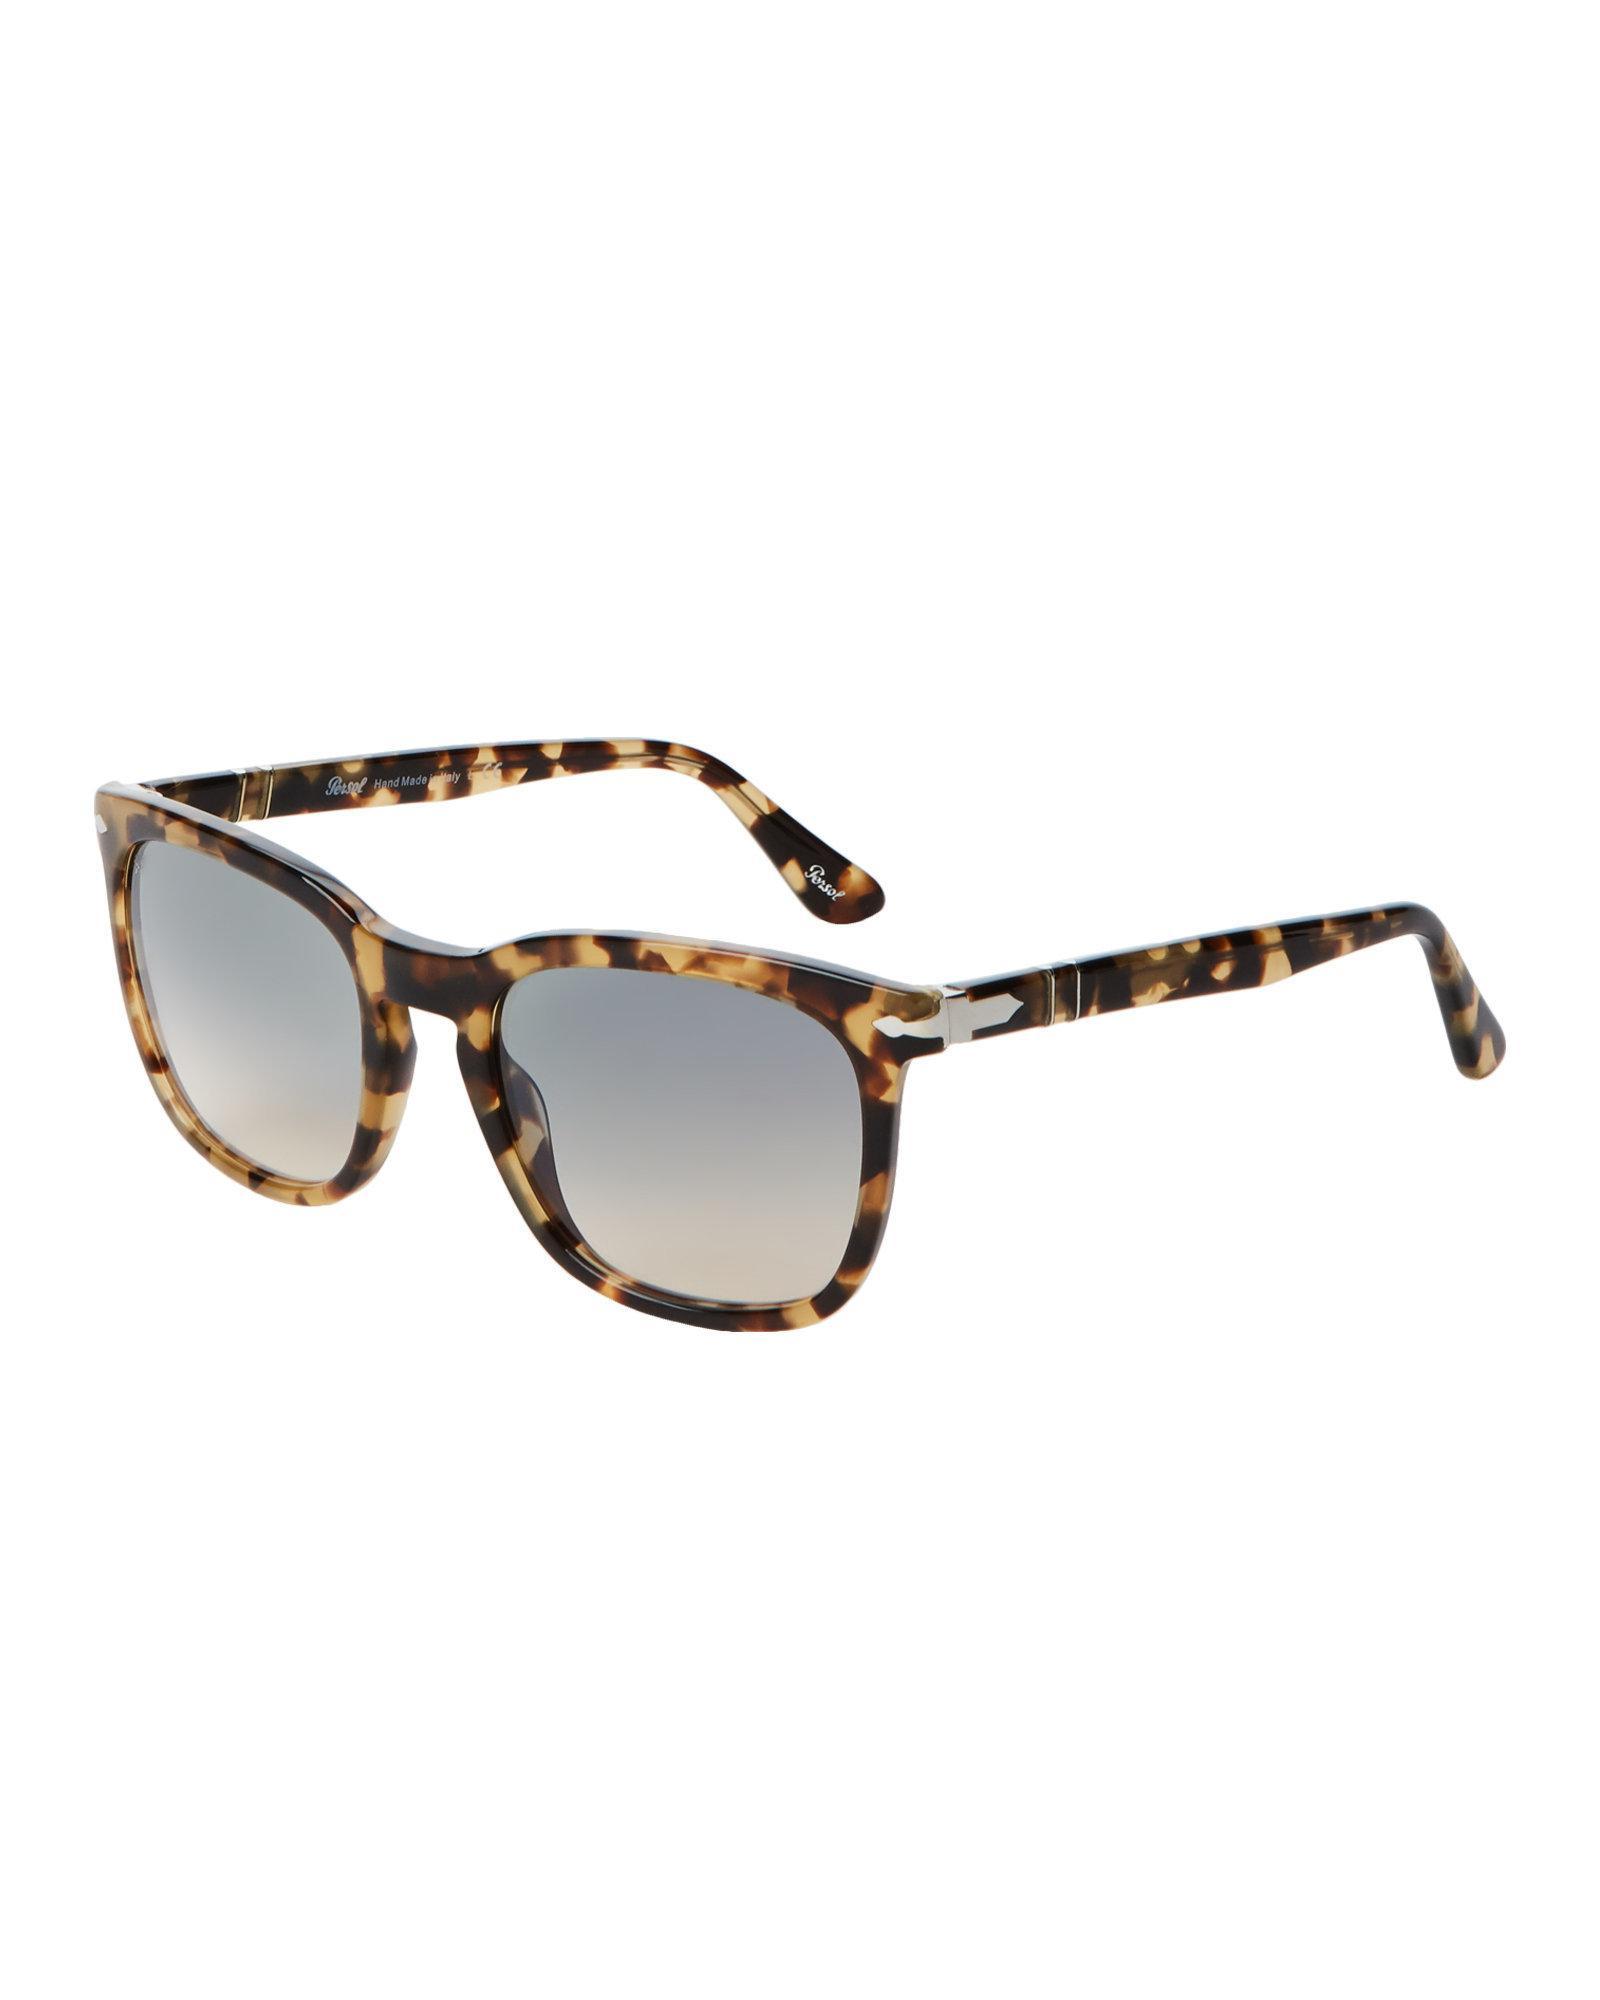 35aa1a89c4 Lyst - Persol Po3193s Biege   Tortoiseshell-look Square Sunglasses ...